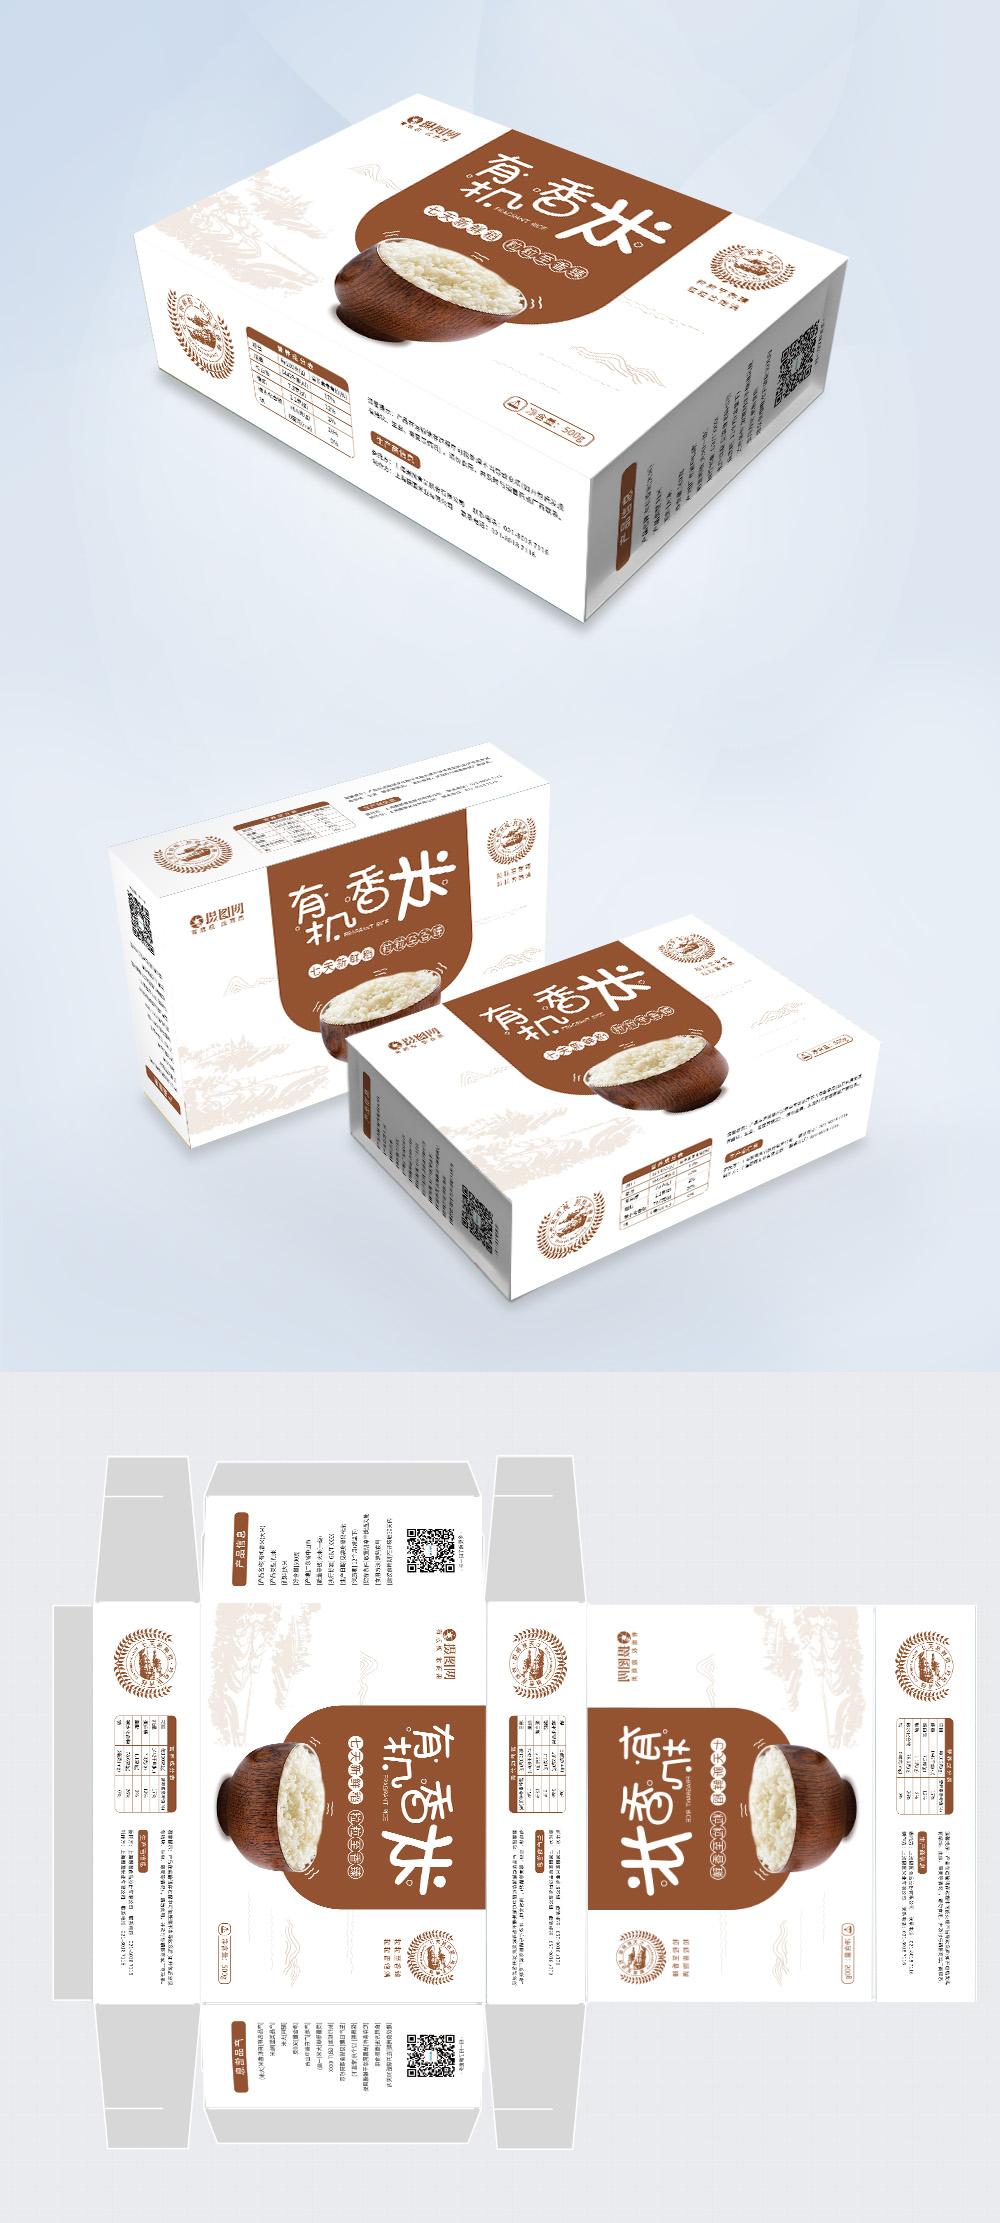 Desain Kemasan Kotak Makanan Beras Wangi Organik gambar ...